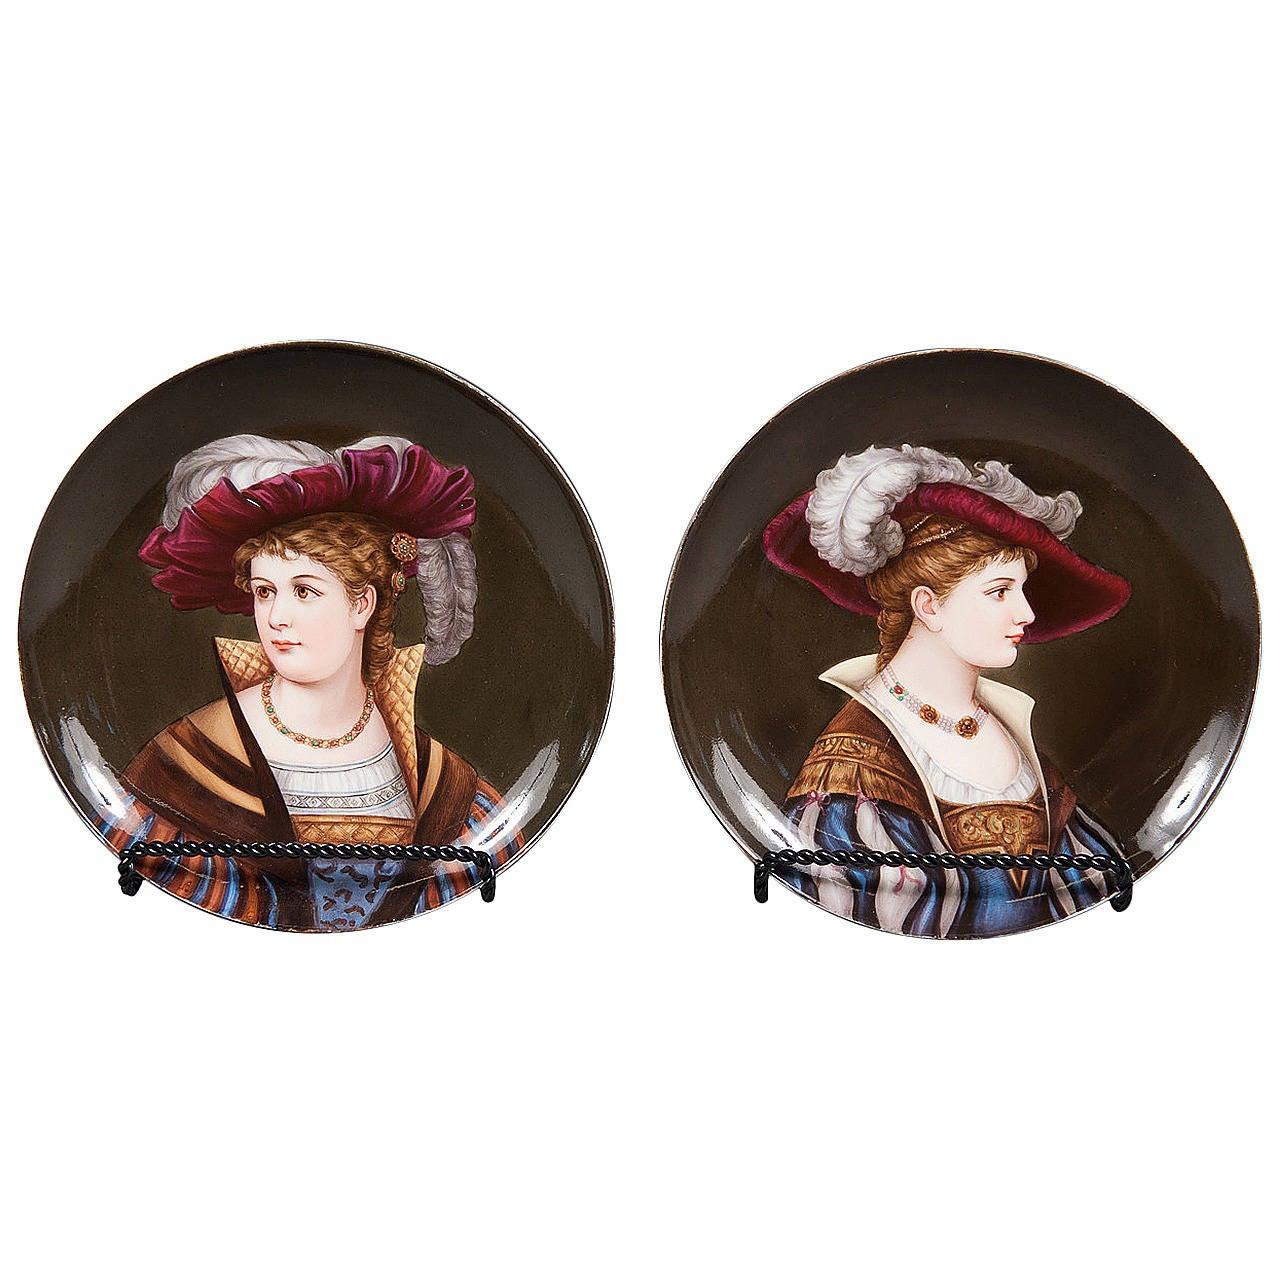 A Pair of 19th Century Vienna Hand Painted Porcelain Portrait Plates